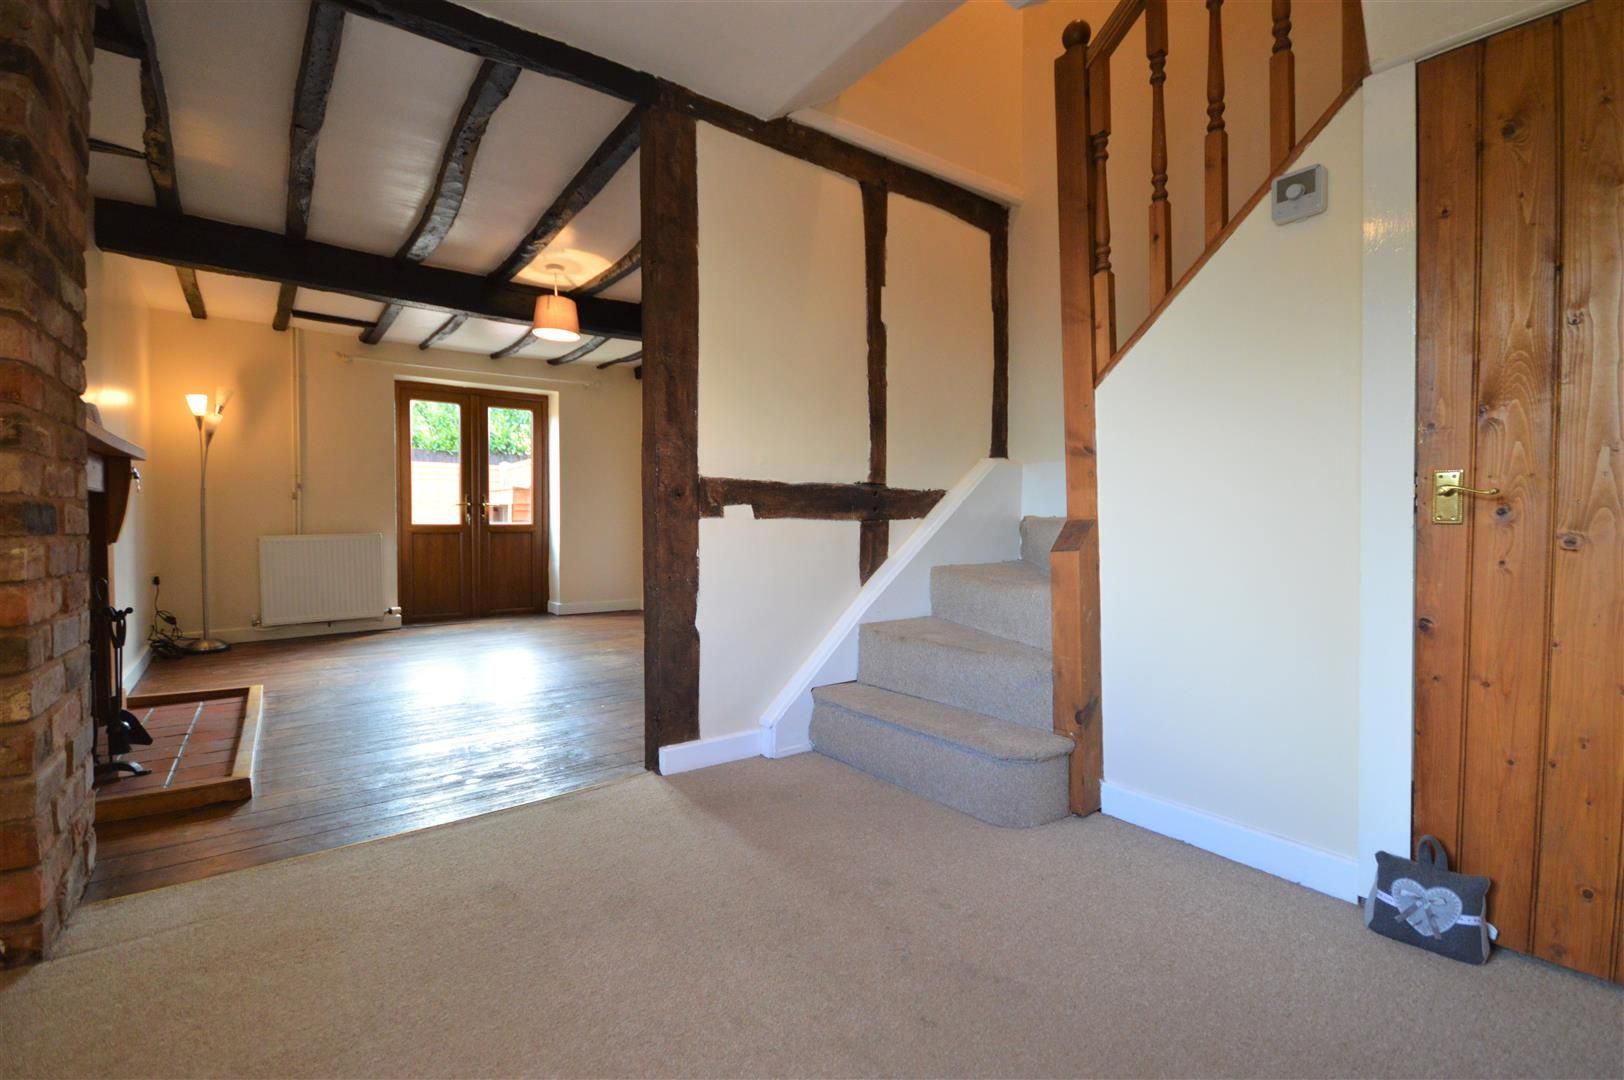 2 bed semi-detached for sale in Kingsland 3